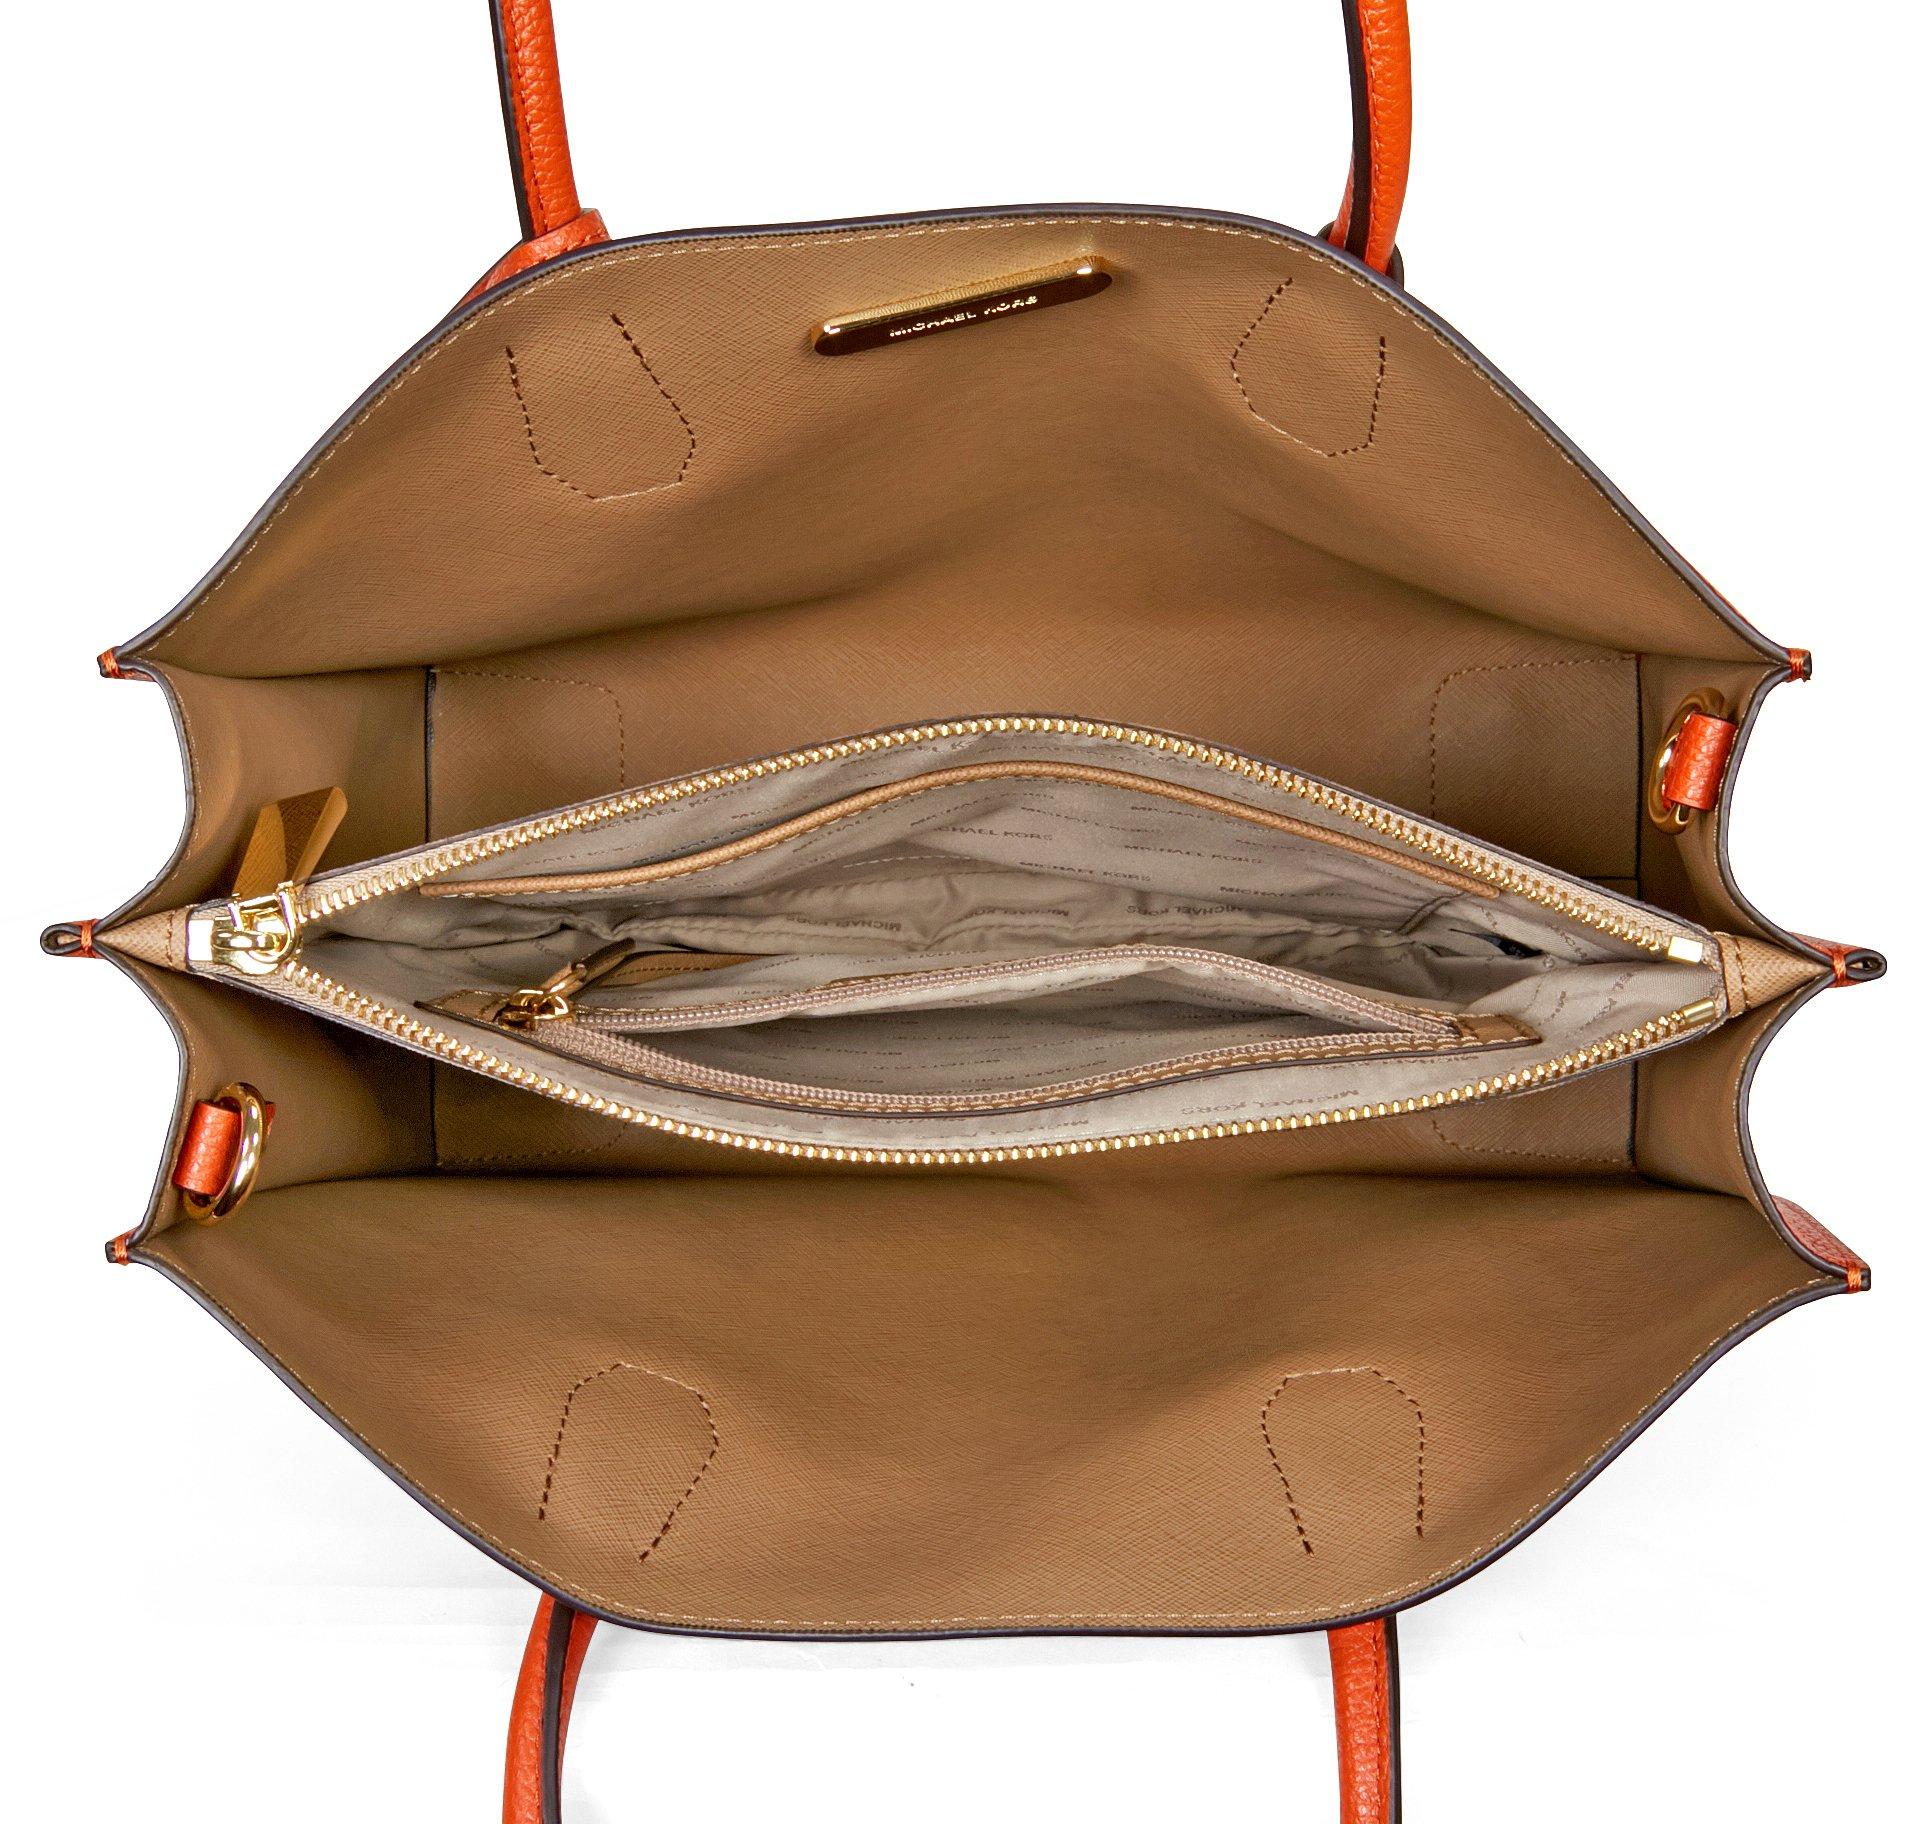 Michael Kors Women's Mercer Large Leather Tote Bag, Orange, OS